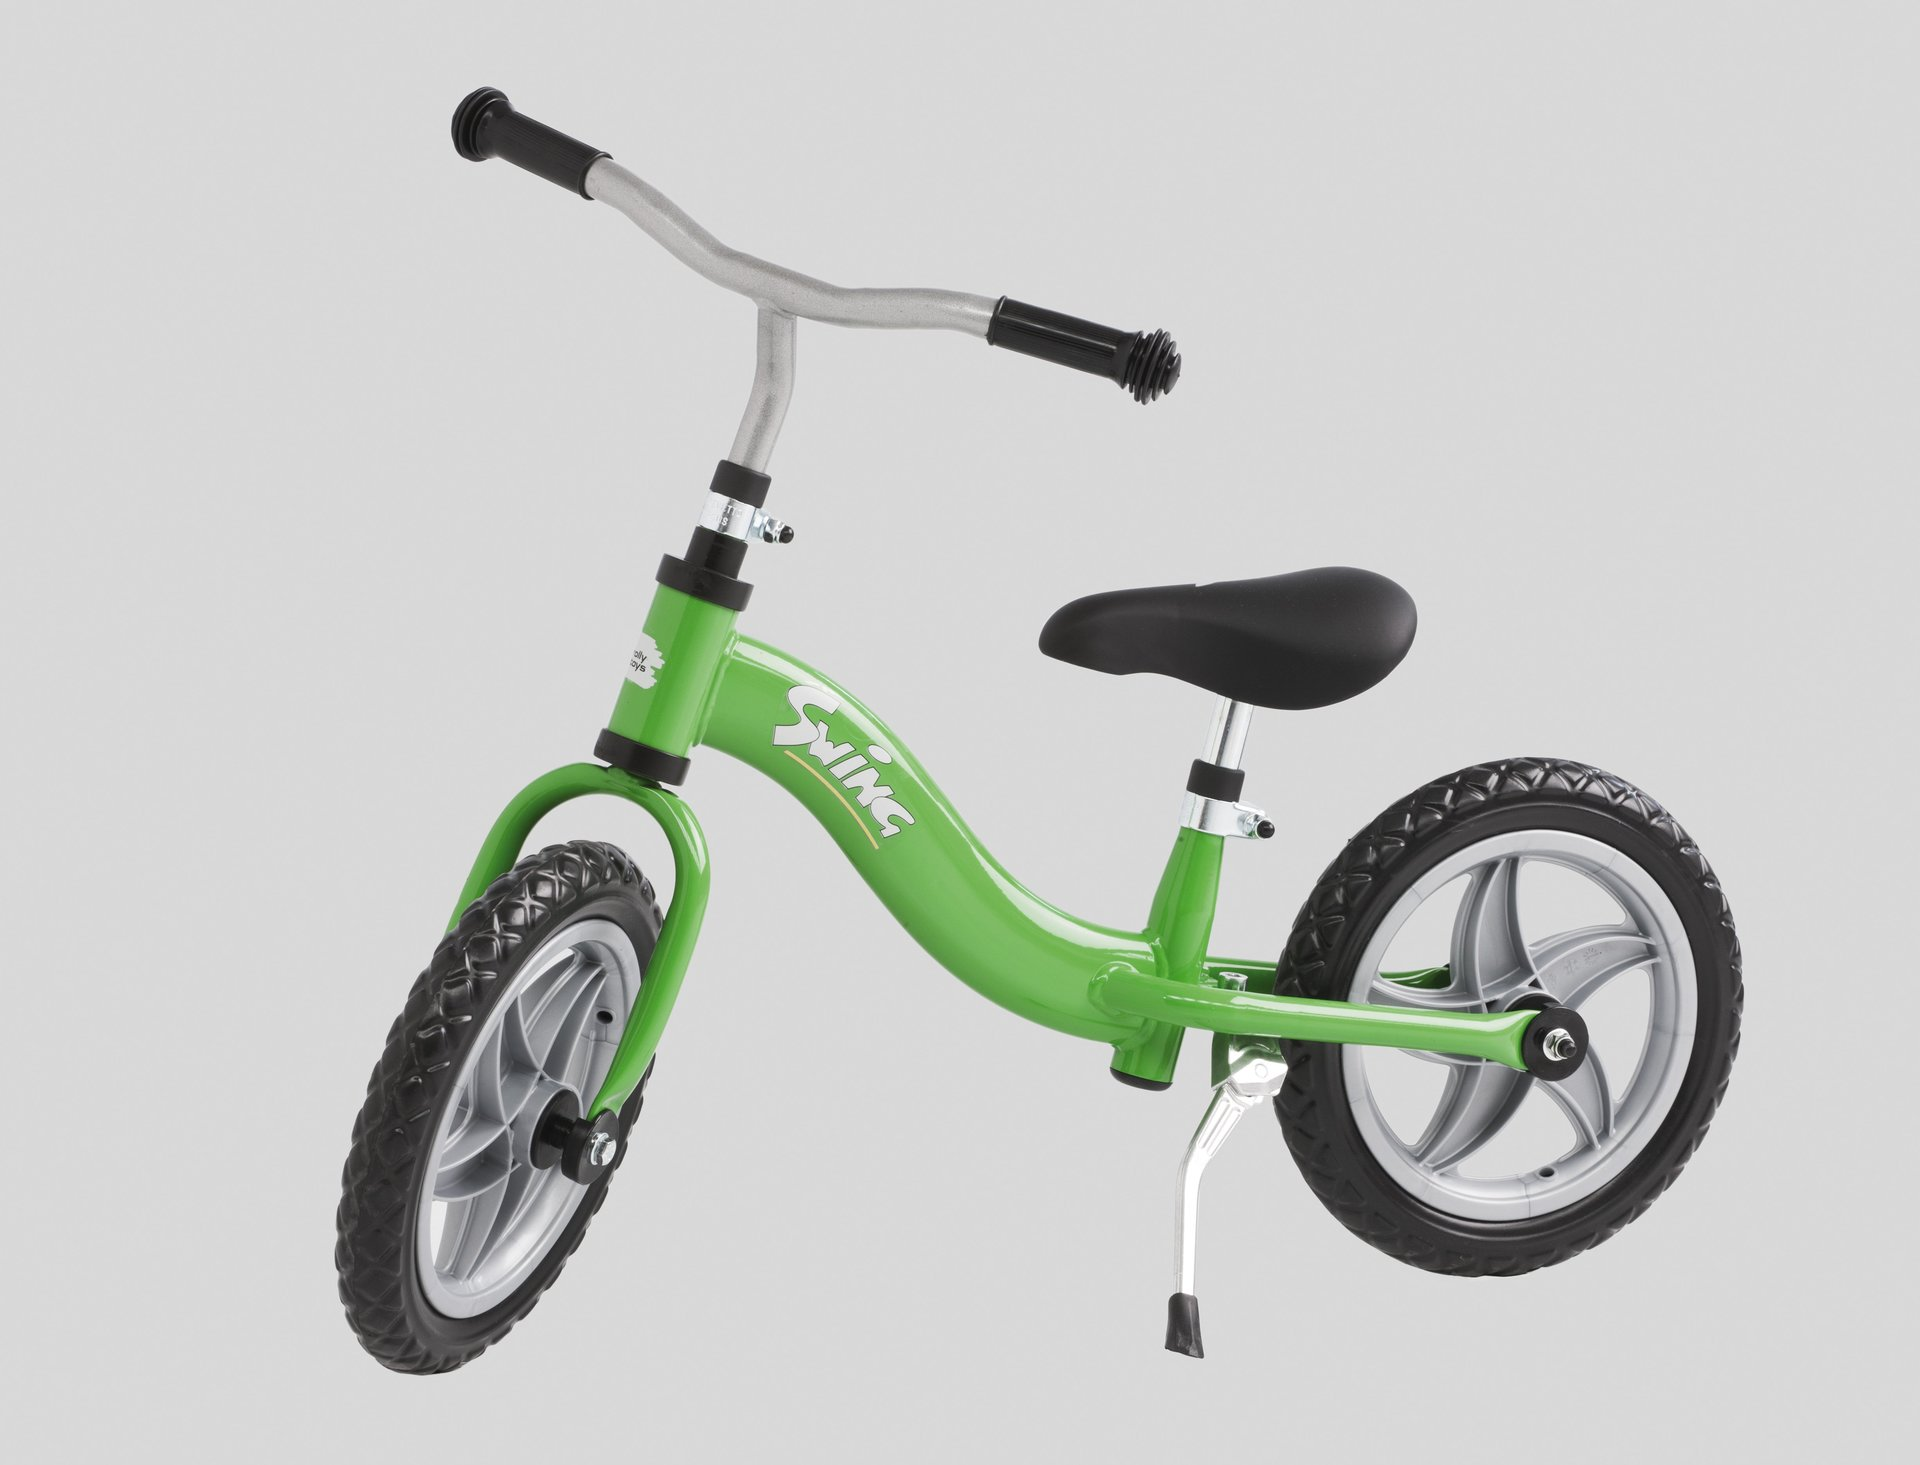 bicicletta swing